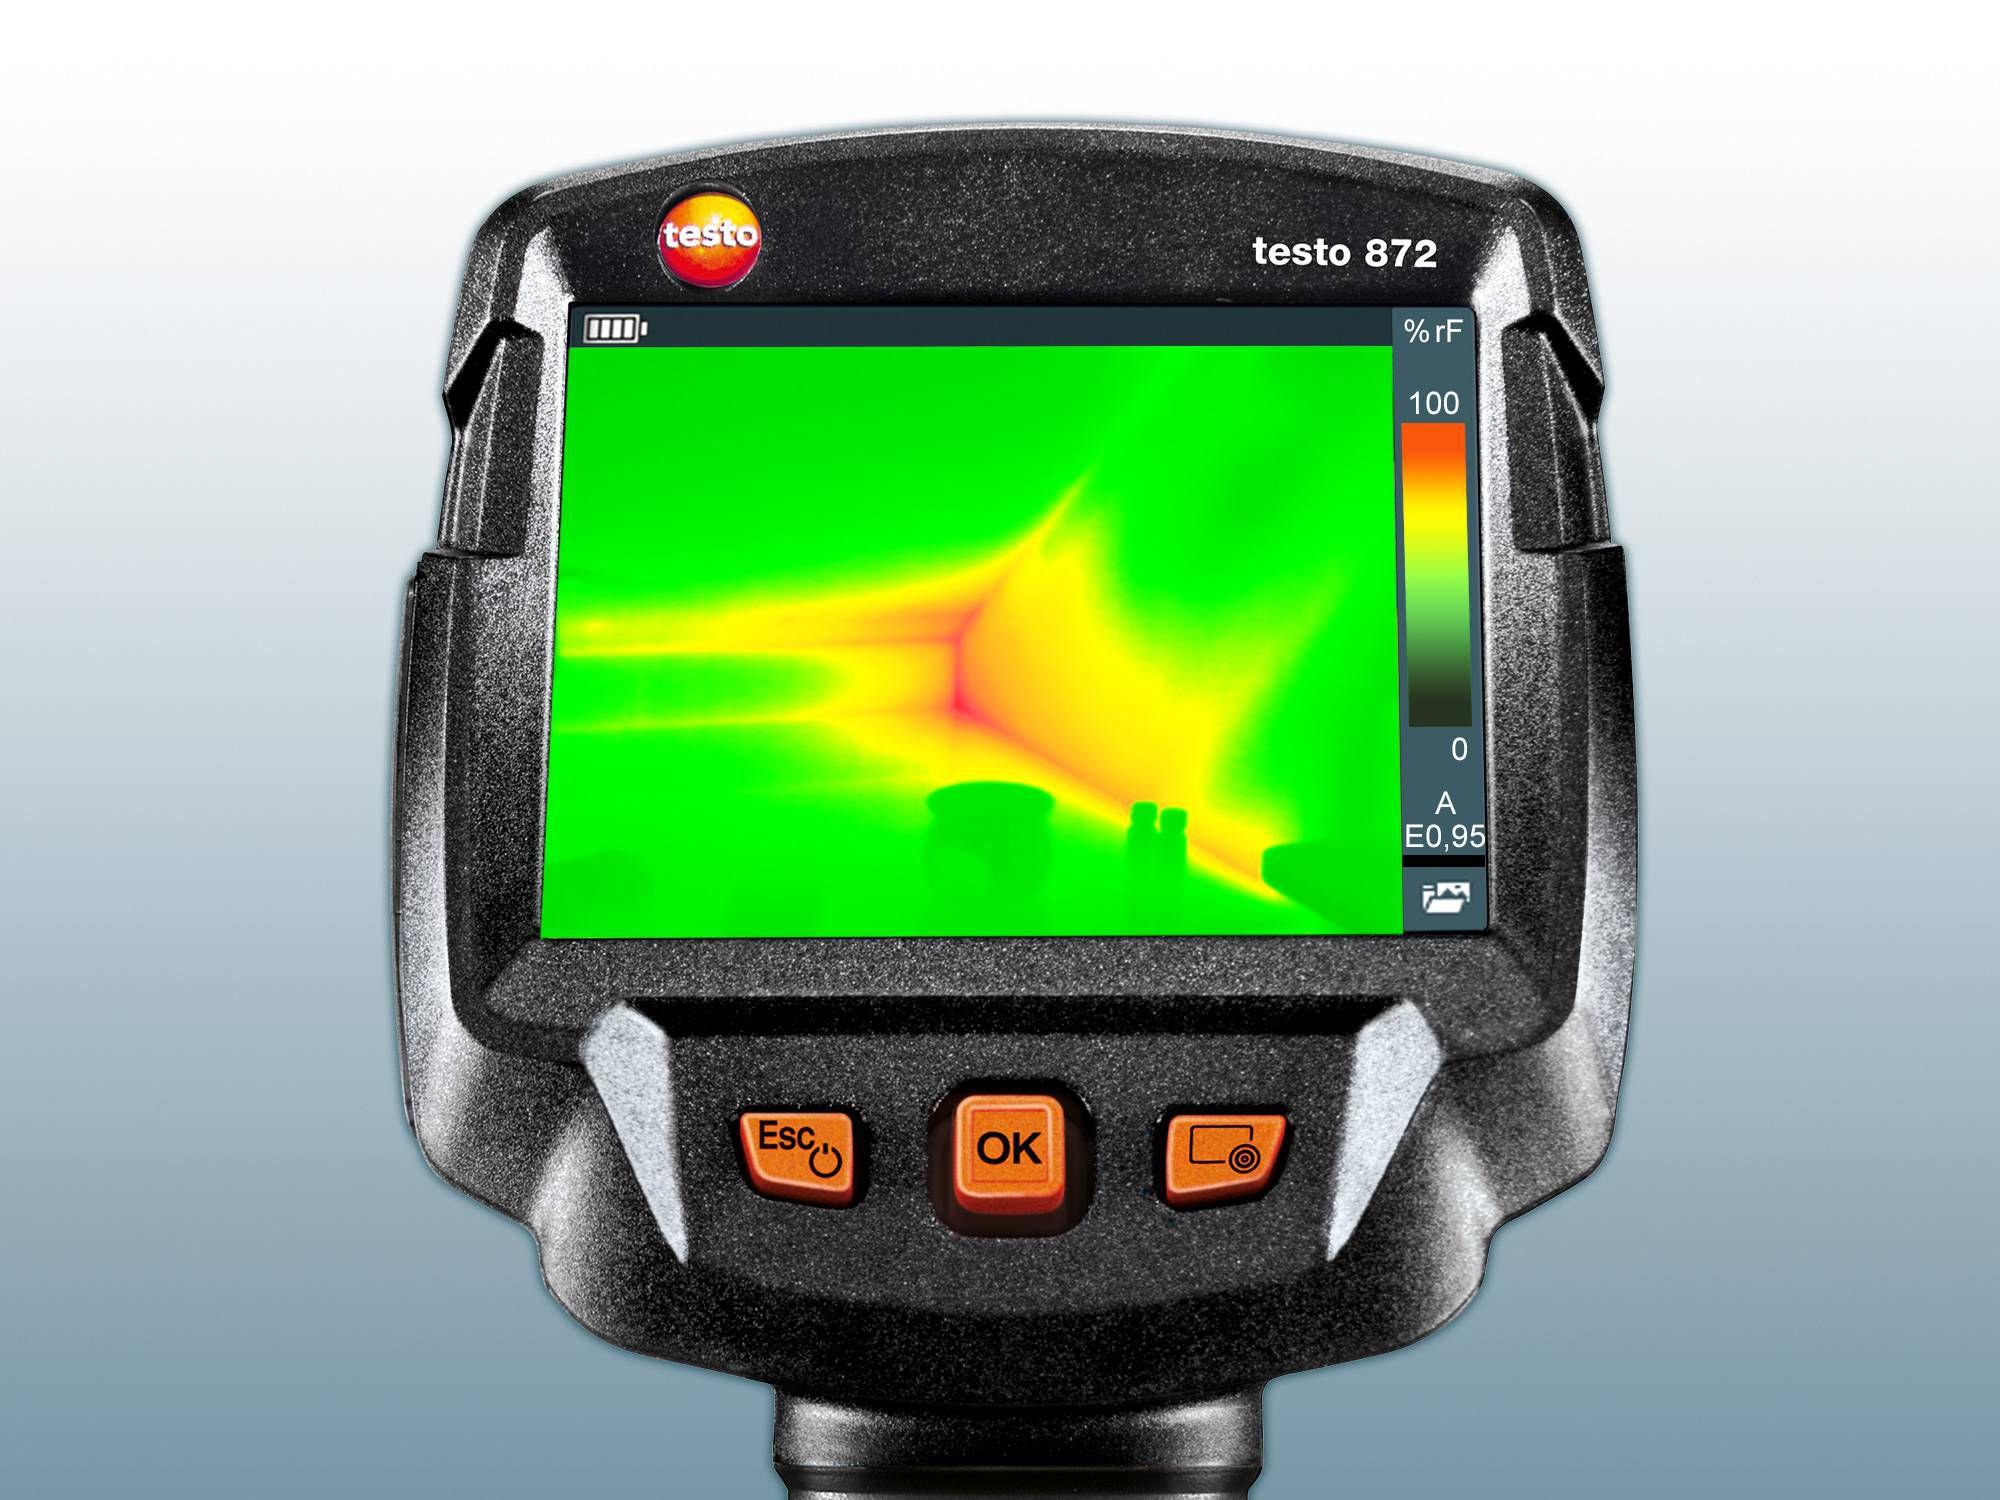 bauthermografie-web-gebauede-Image-3-1-2000x1500px.jpg